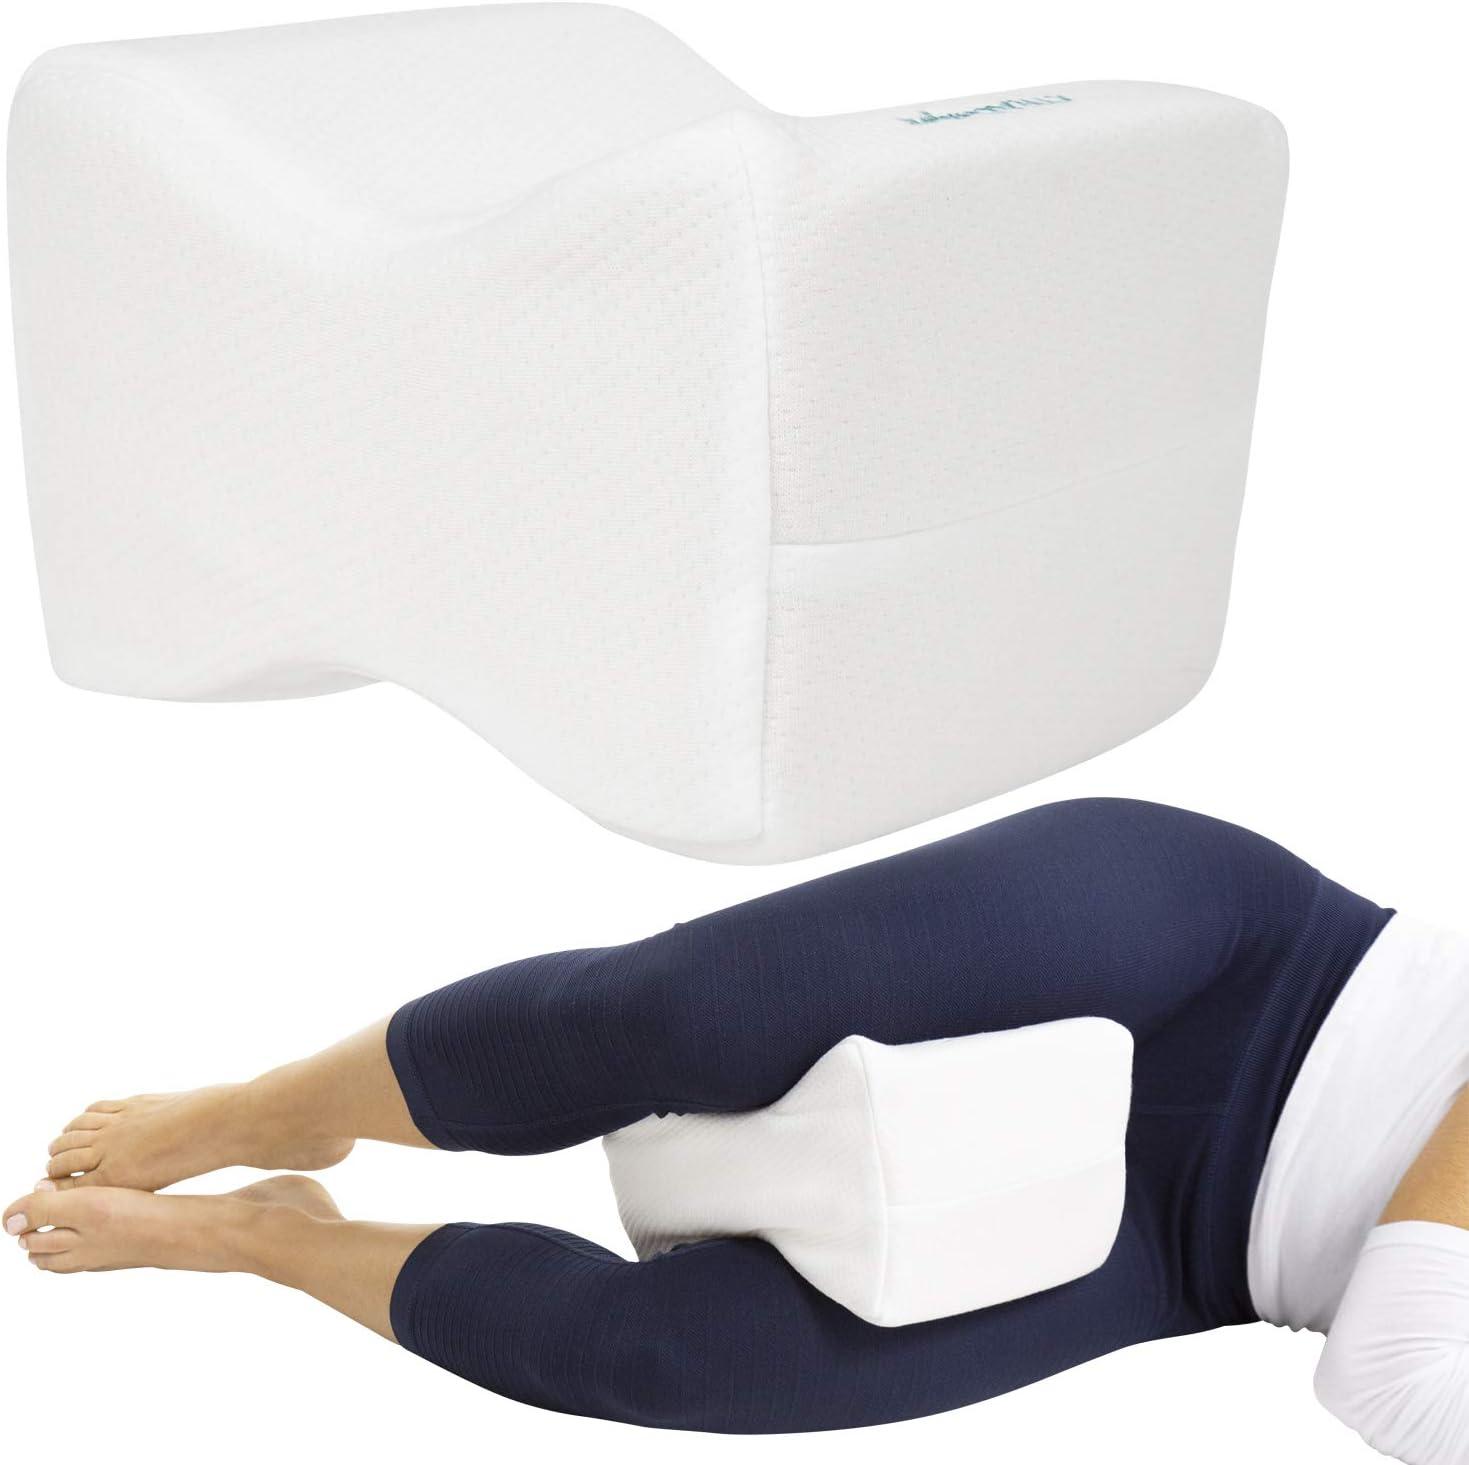 Xtra-Comfort Memory Foam El Paso Mall Knee Pillow Sciatica New popularity - Back Orthepedic